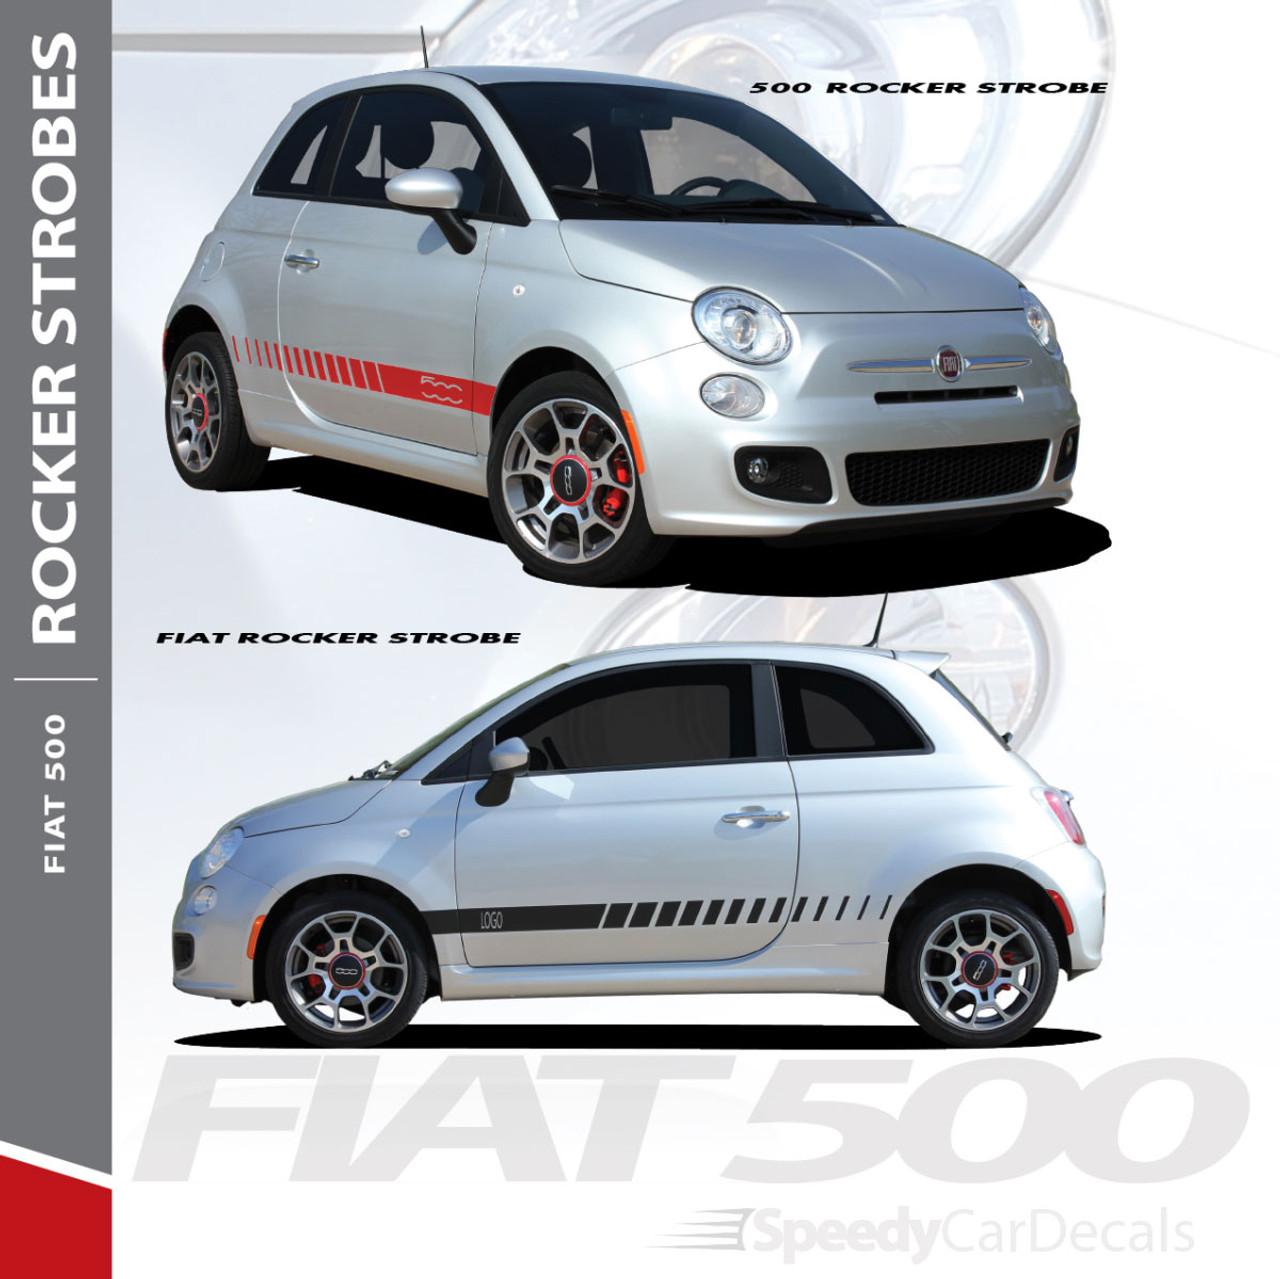 500 STROBE ROCKER Fiat 500 Abarth Side Stripes 3M 2012-2018 Premium and  Supreme Install